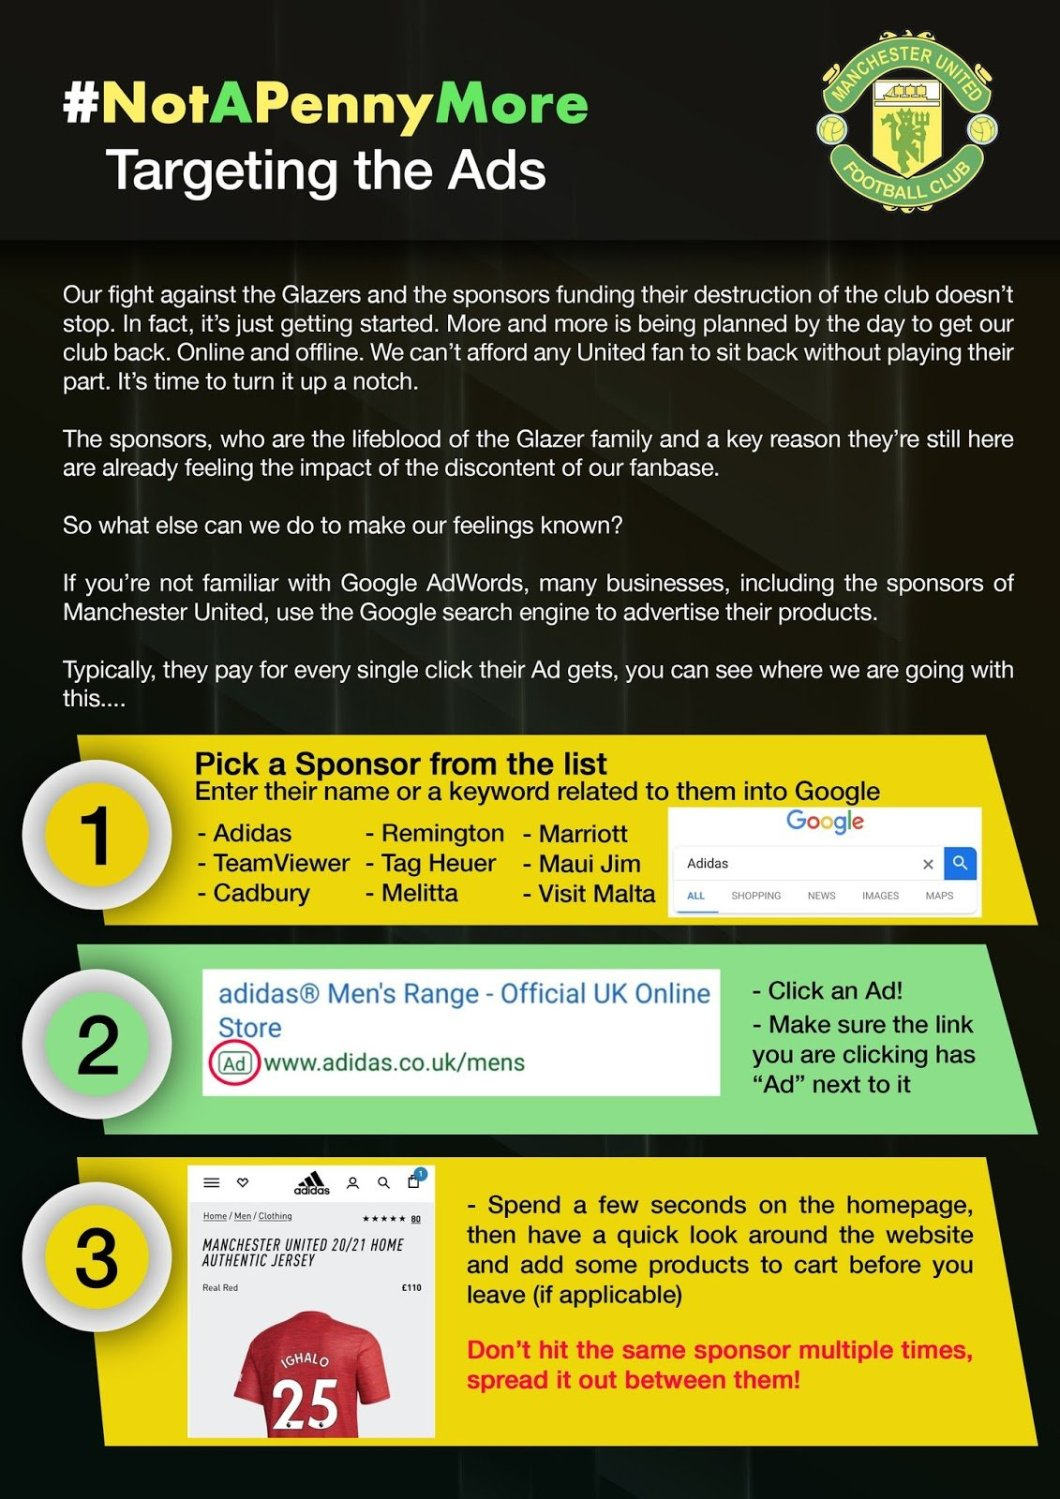 click fraud instructions by soccer fans of Man Utd